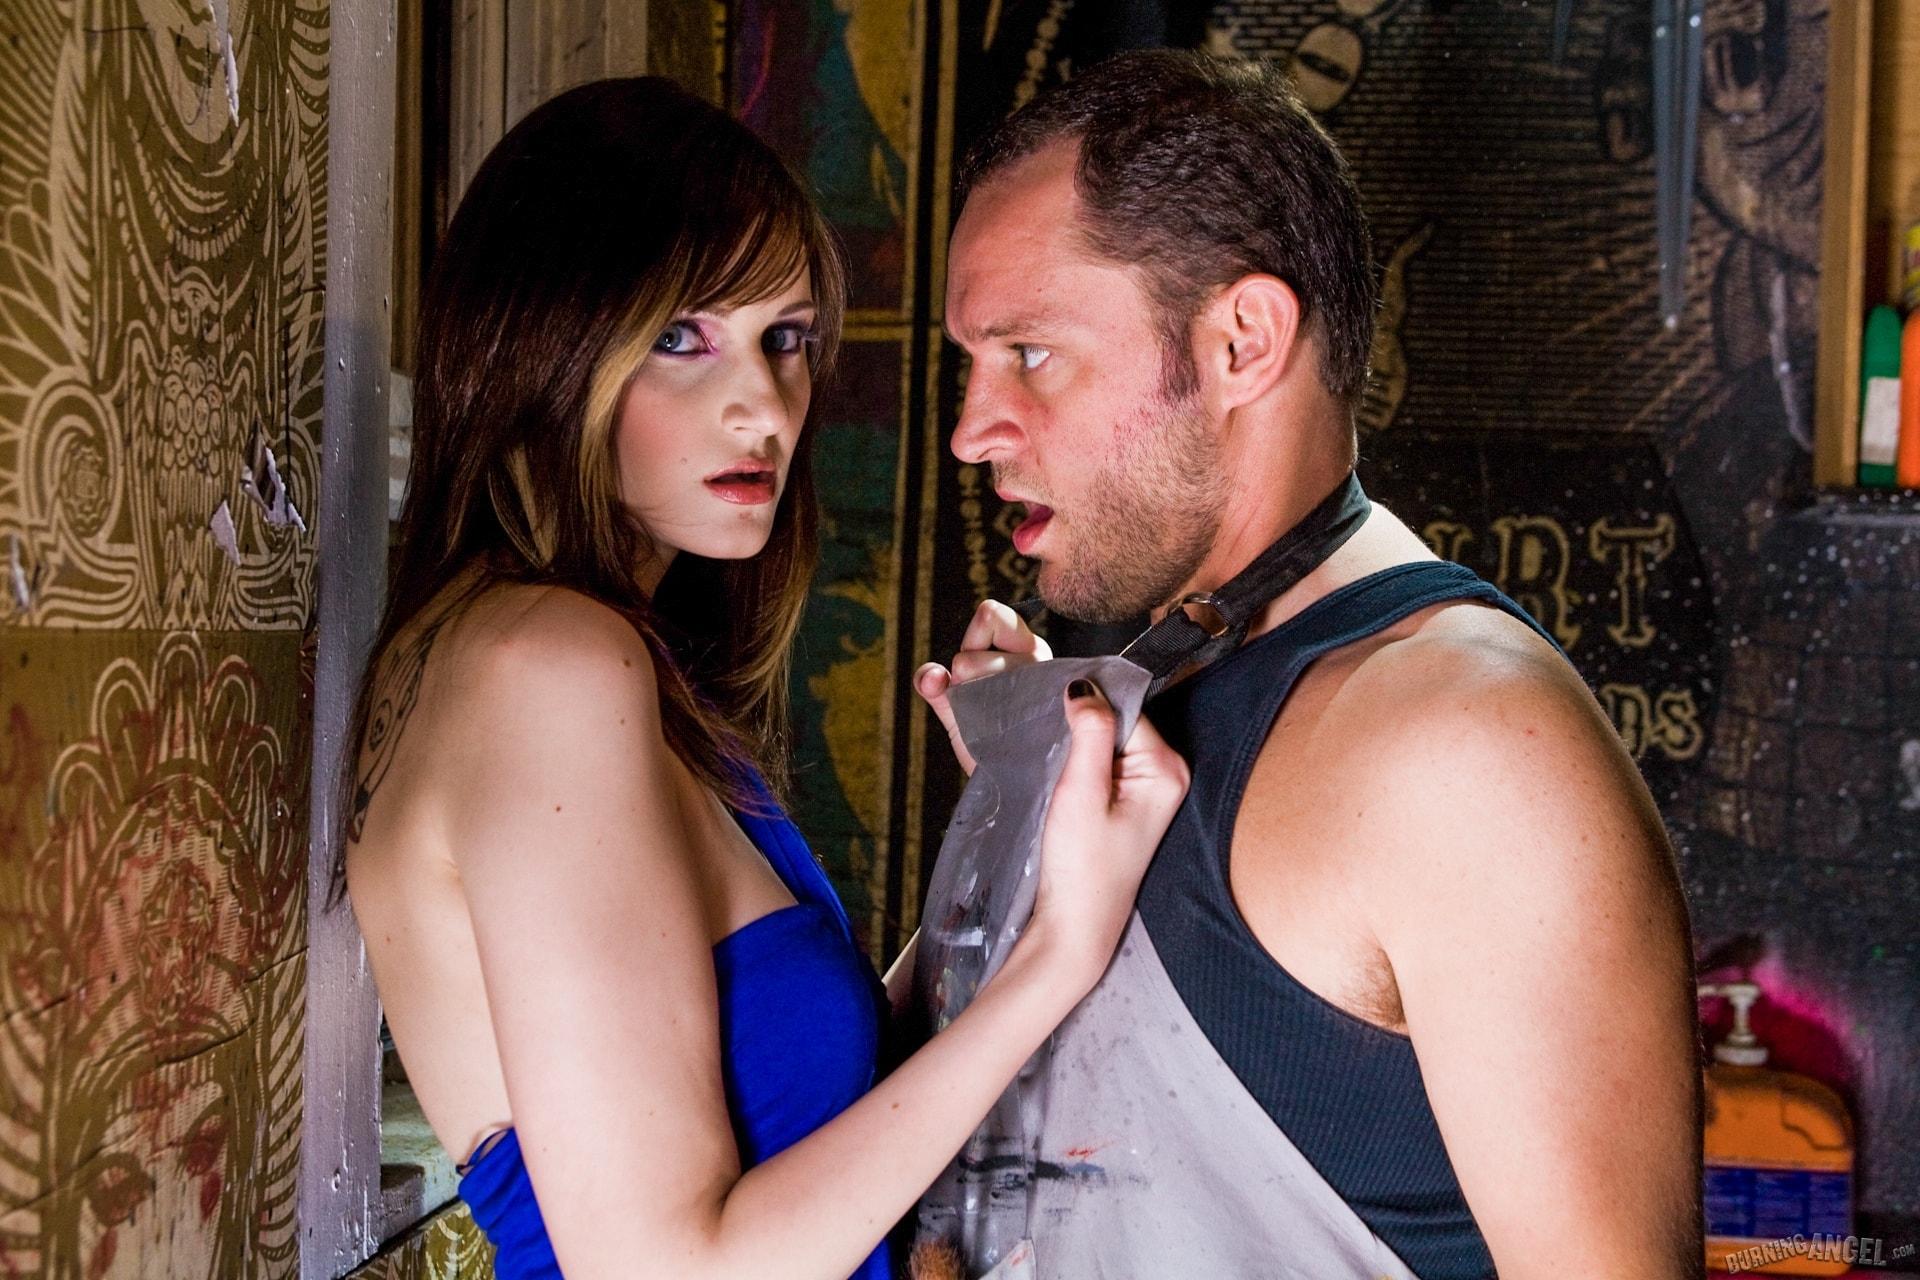 Burning Angel 'Artist Bathroom Sex' starring Phoenix Askani (Photo 1)